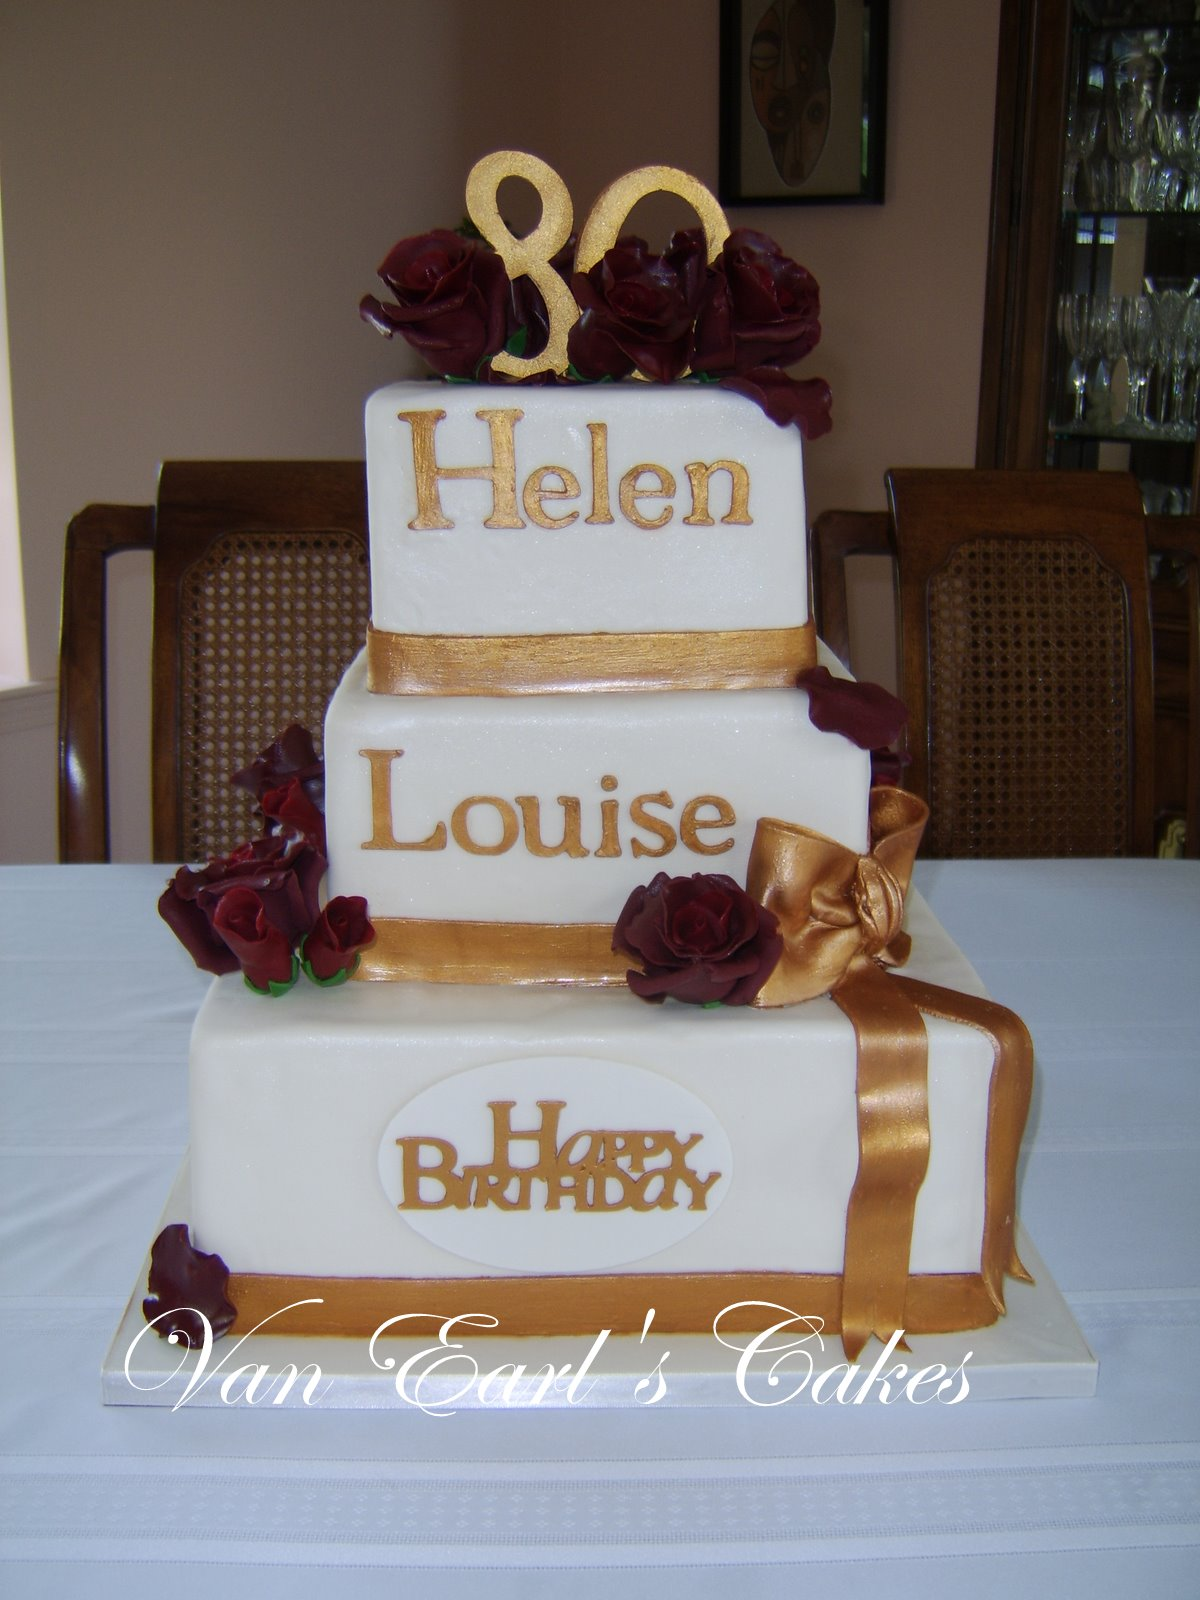 Van Earls Cakes 80th Birthday Cake